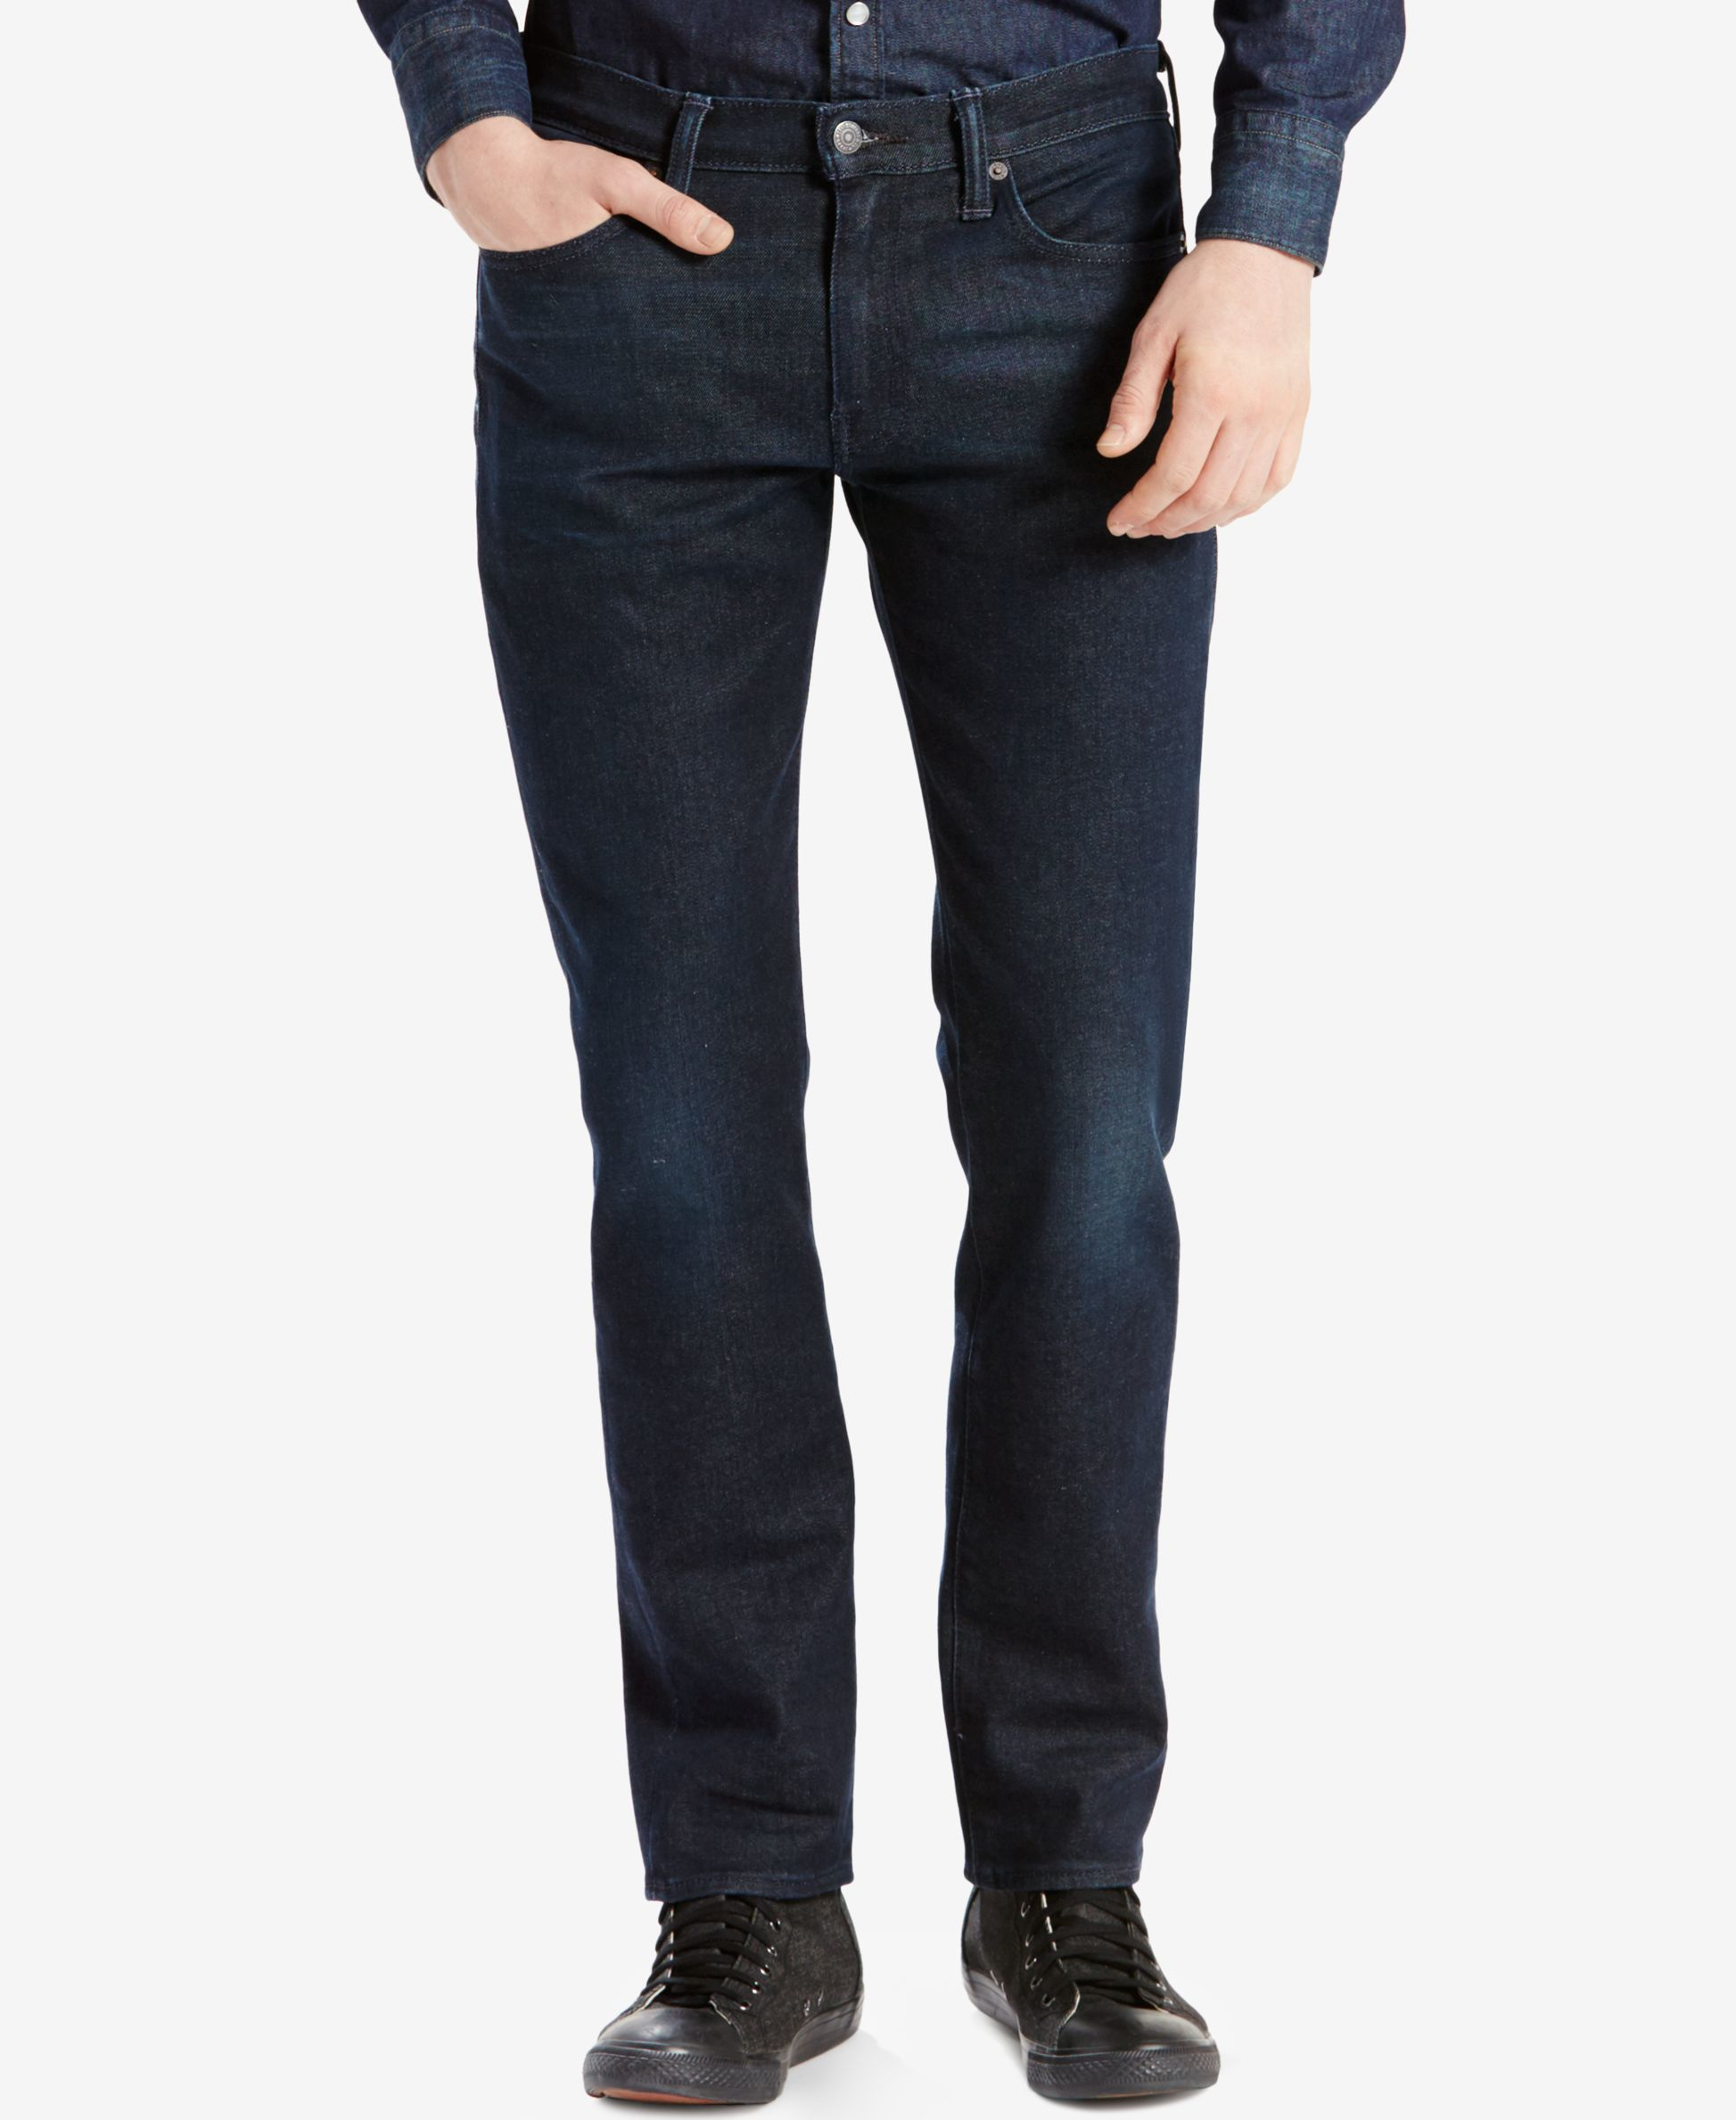 levi 39 s 511 slim fit performance stretch jeans in blue for. Black Bedroom Furniture Sets. Home Design Ideas